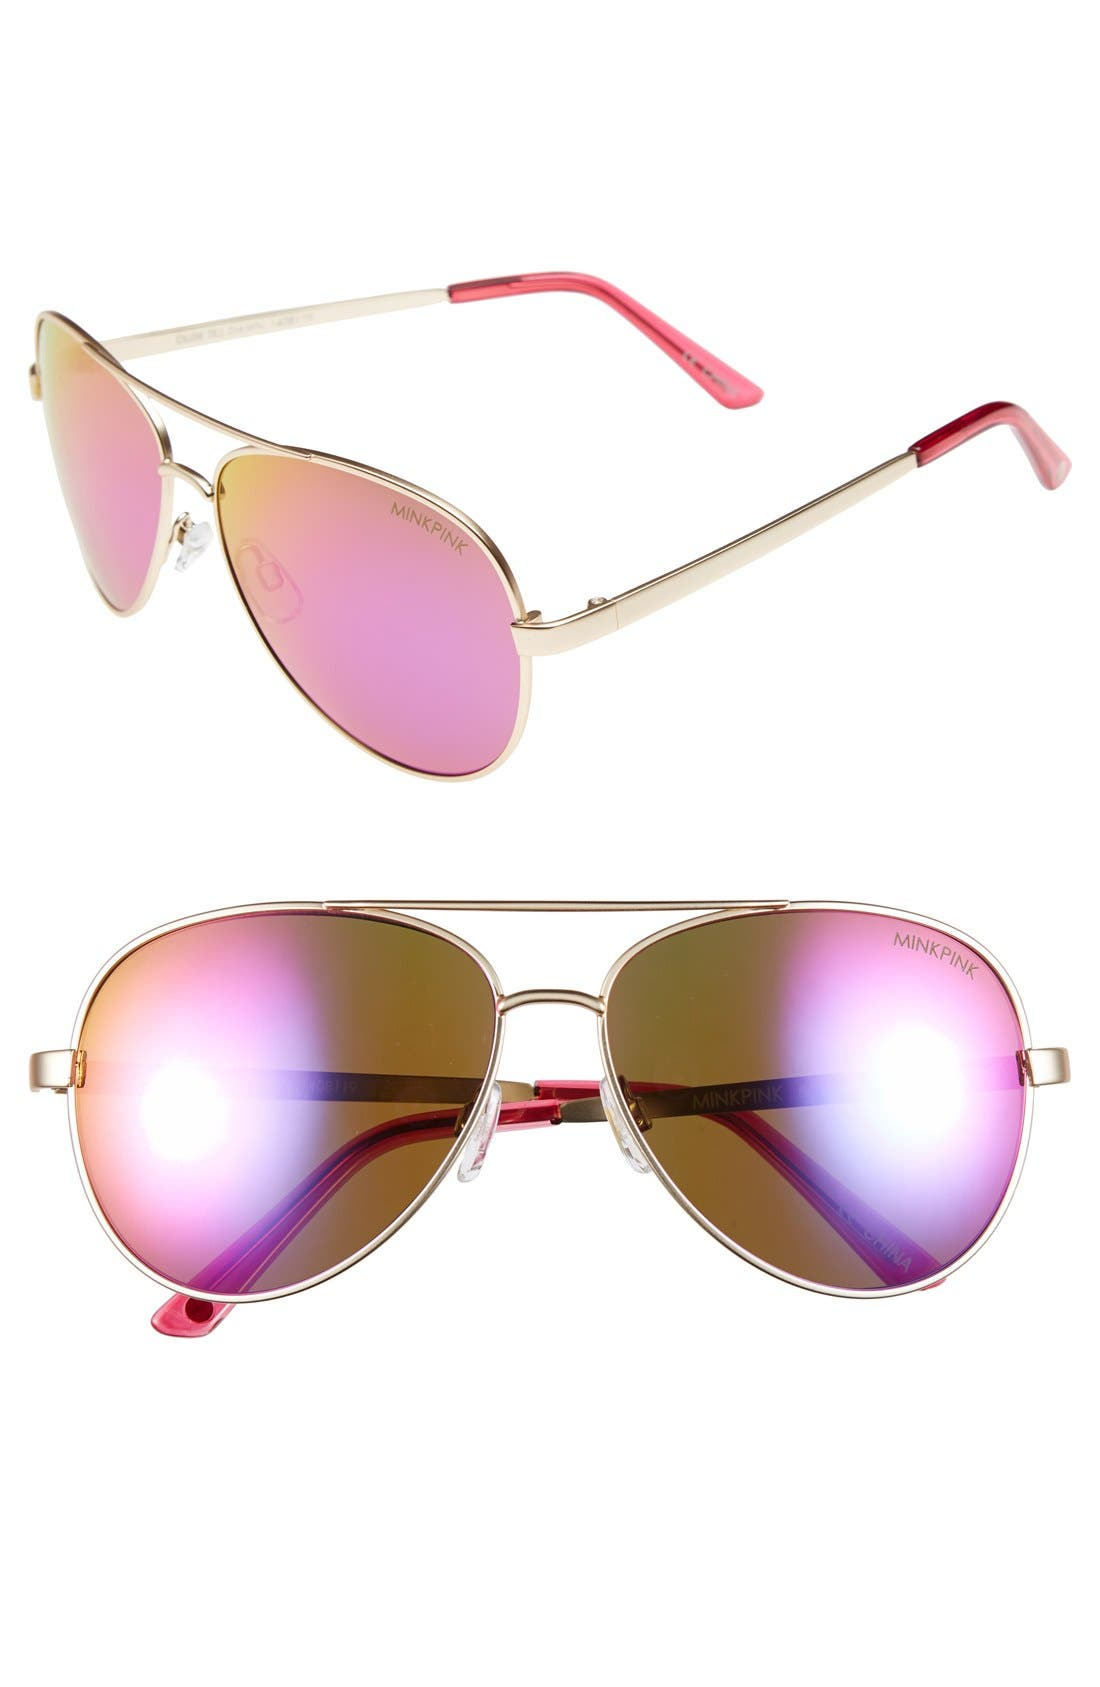 Main Image - MINKPINK 60mm Aviator Sunglasses